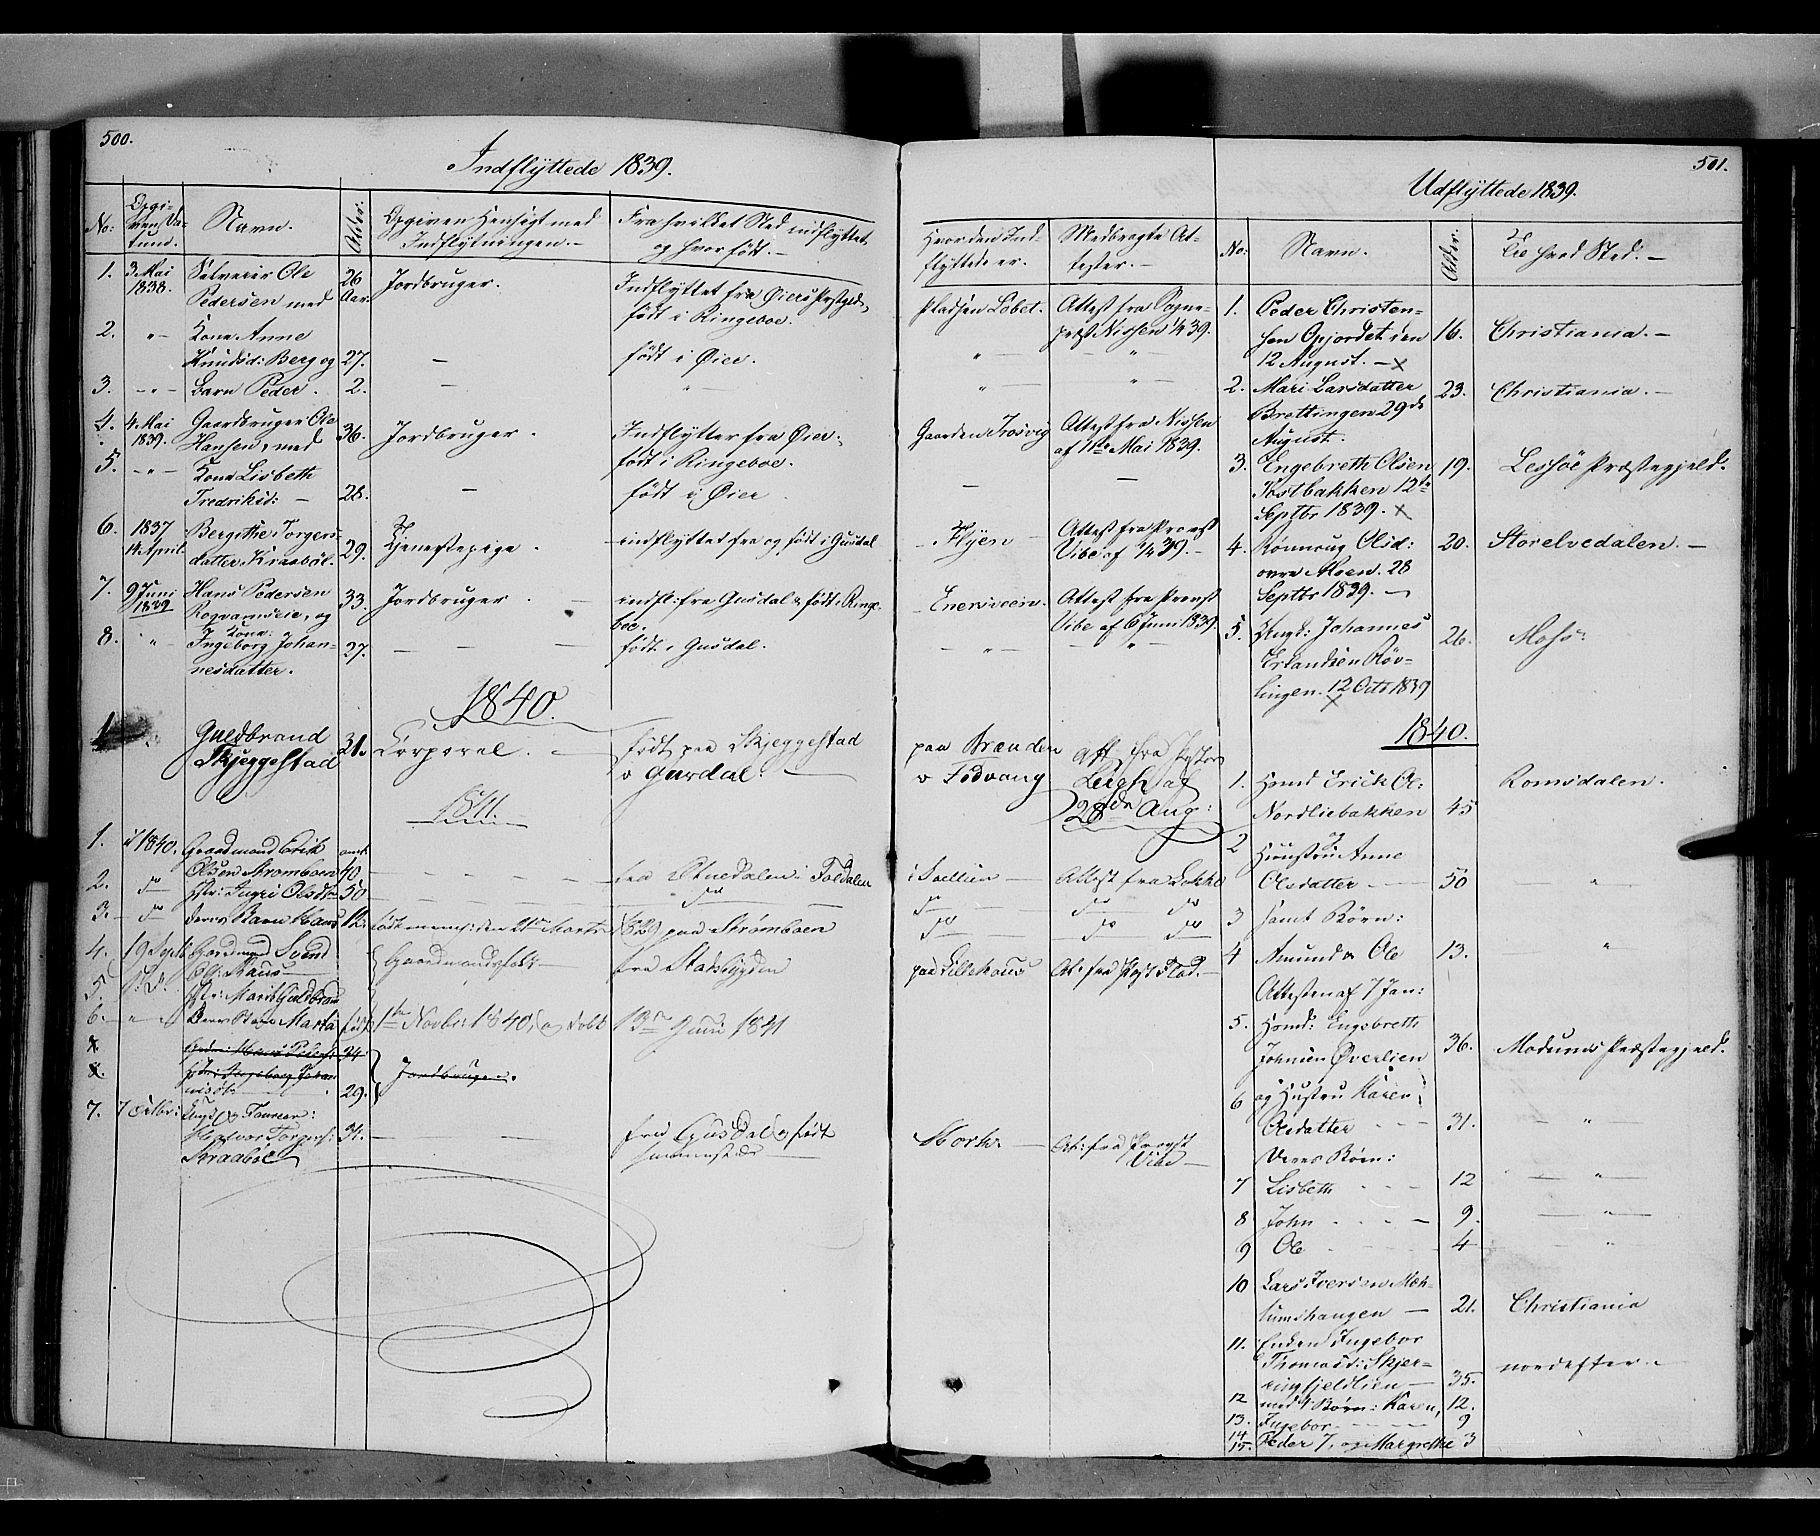 SAH, Ringebu prestekontor, Ministerialbok nr. 5, 1839-1848, s. 500-501